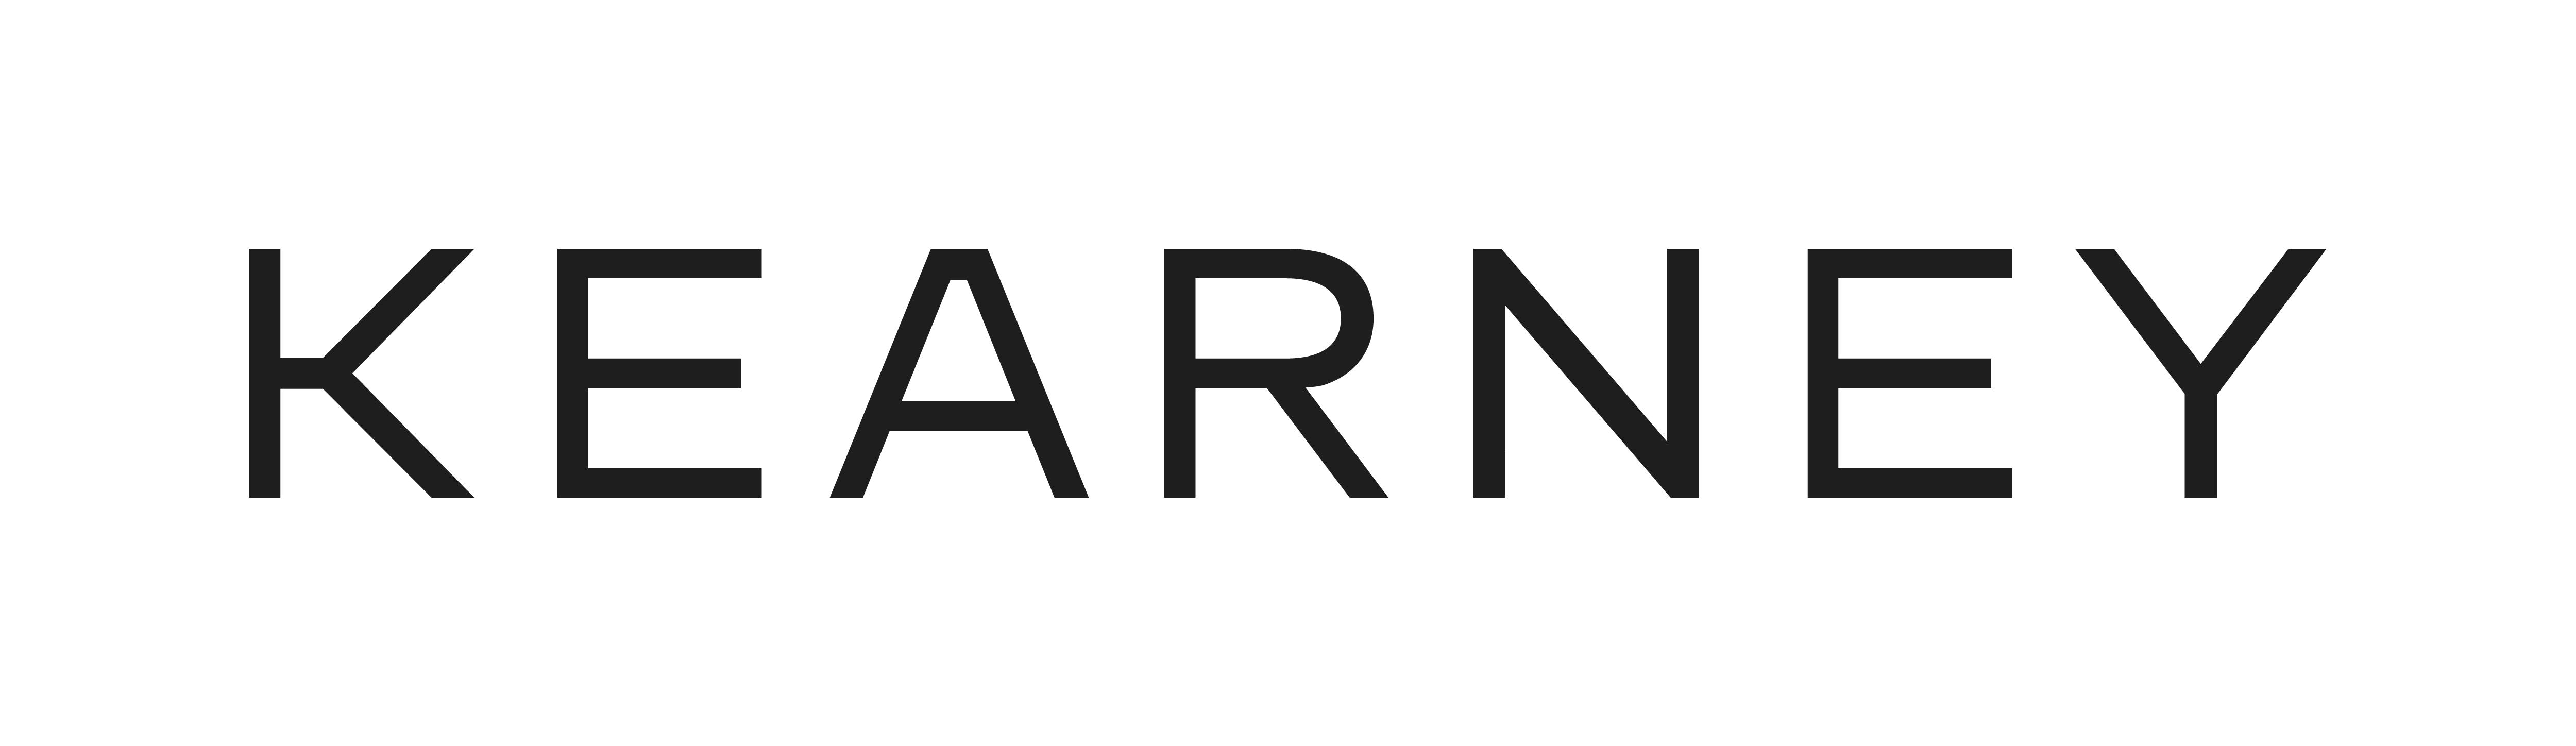 File:KEARNEY-Logo-Slate-RGB 30,30,30 on white.jpg - Wikimedia Commons